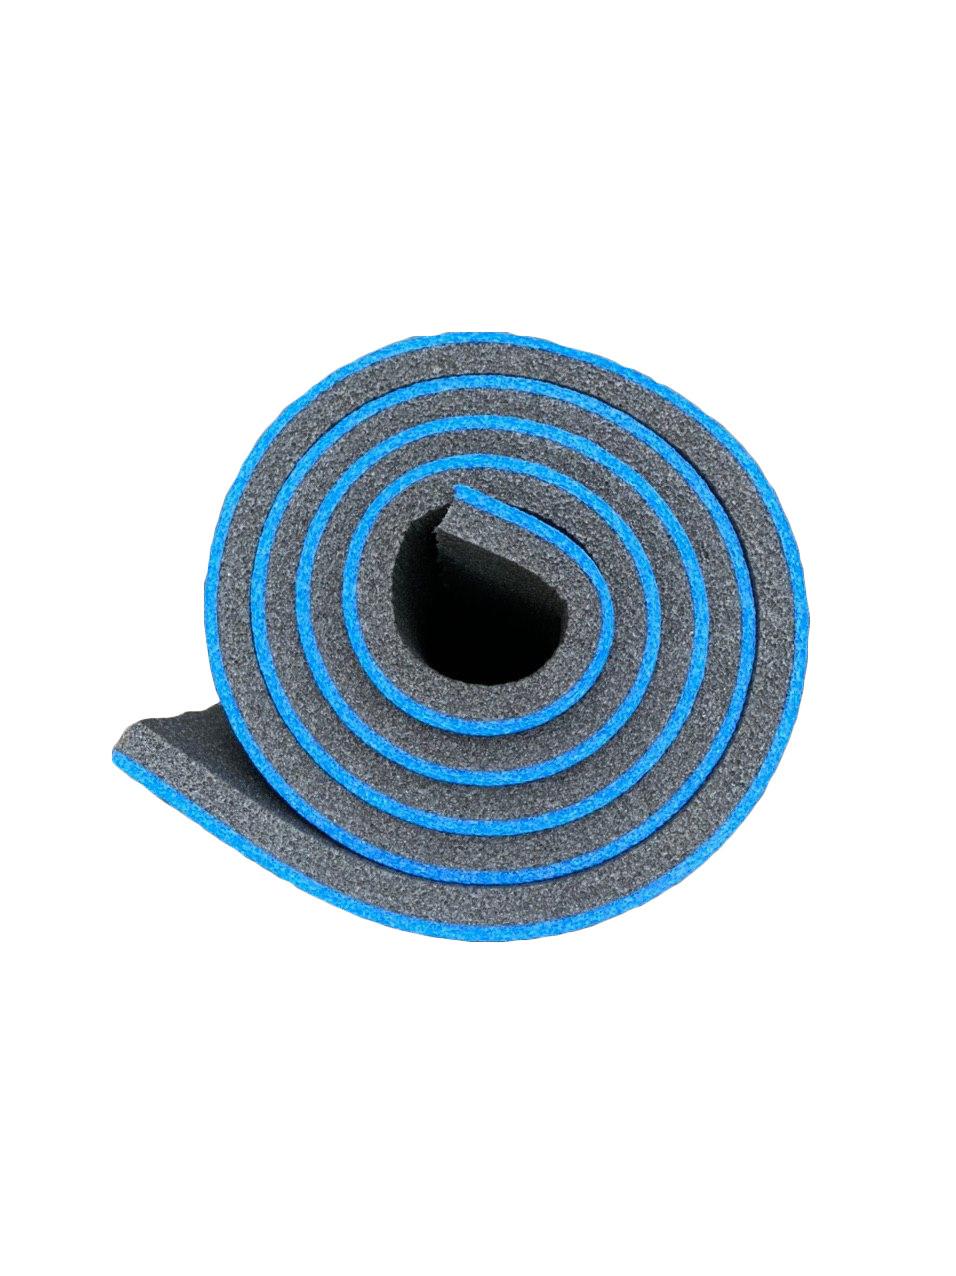 Каремат туристический, сине-серый, т. 12 мм, размер 60х180 см, производитель Украина, TERMOIZOL®